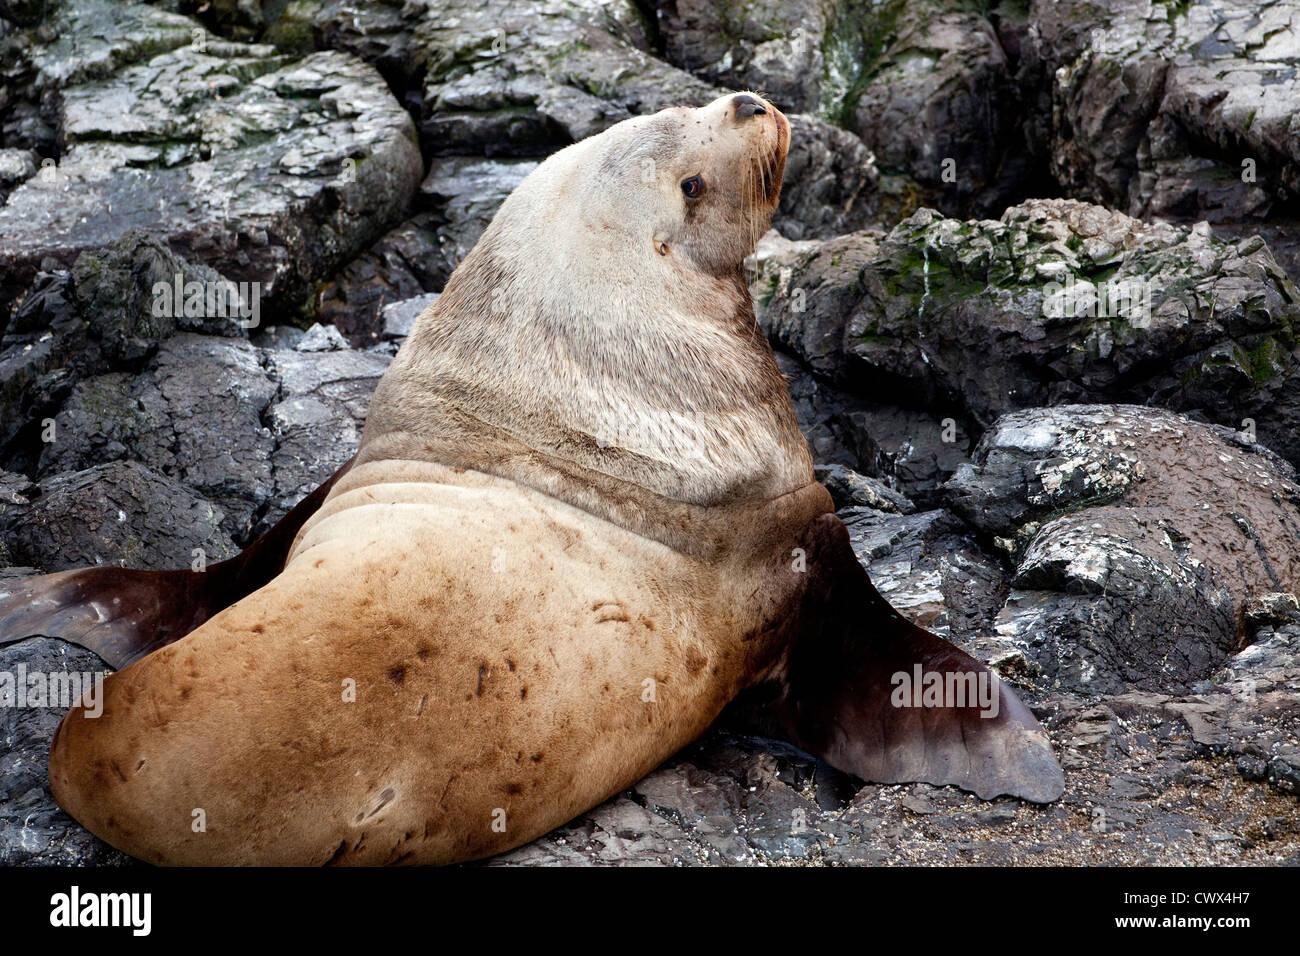 A large male Stellar Sea Lion (Eumetopias jubatus) hauled out on rocks along the coast of Alaska. - Stock Image